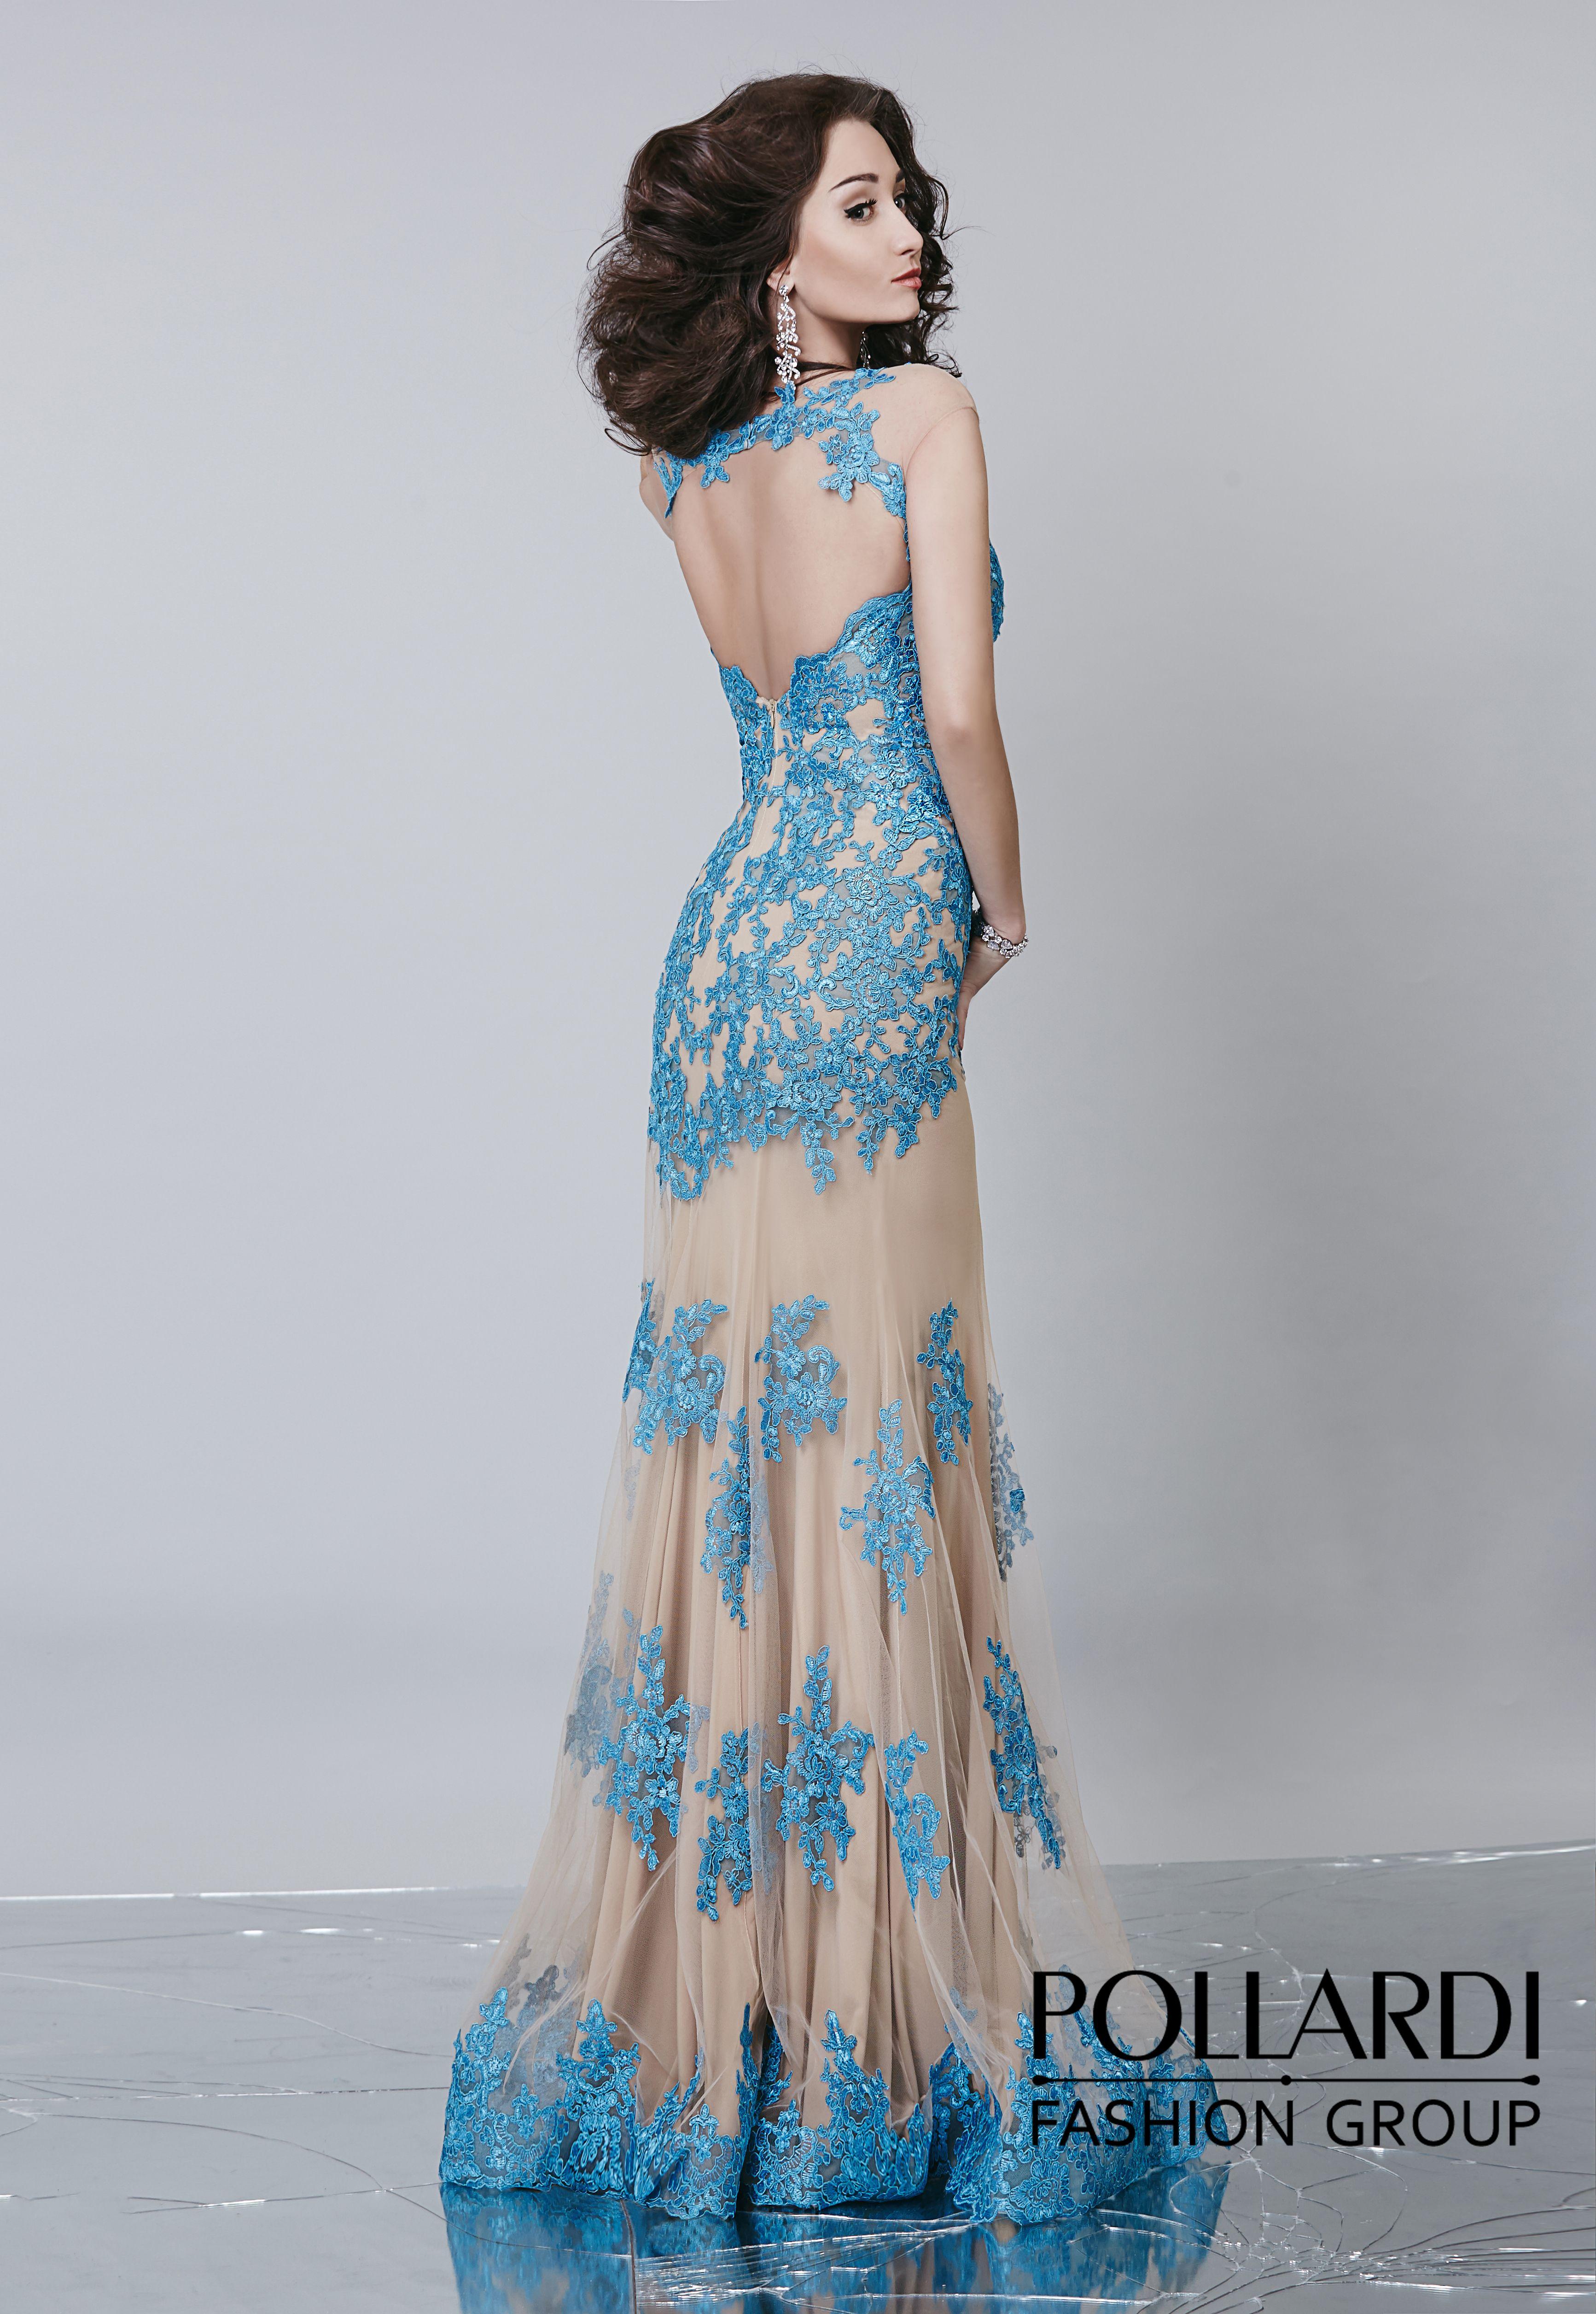 Pollardi Fashion Group | Prom dresses Pollardi | Pinterest | Fashion ...